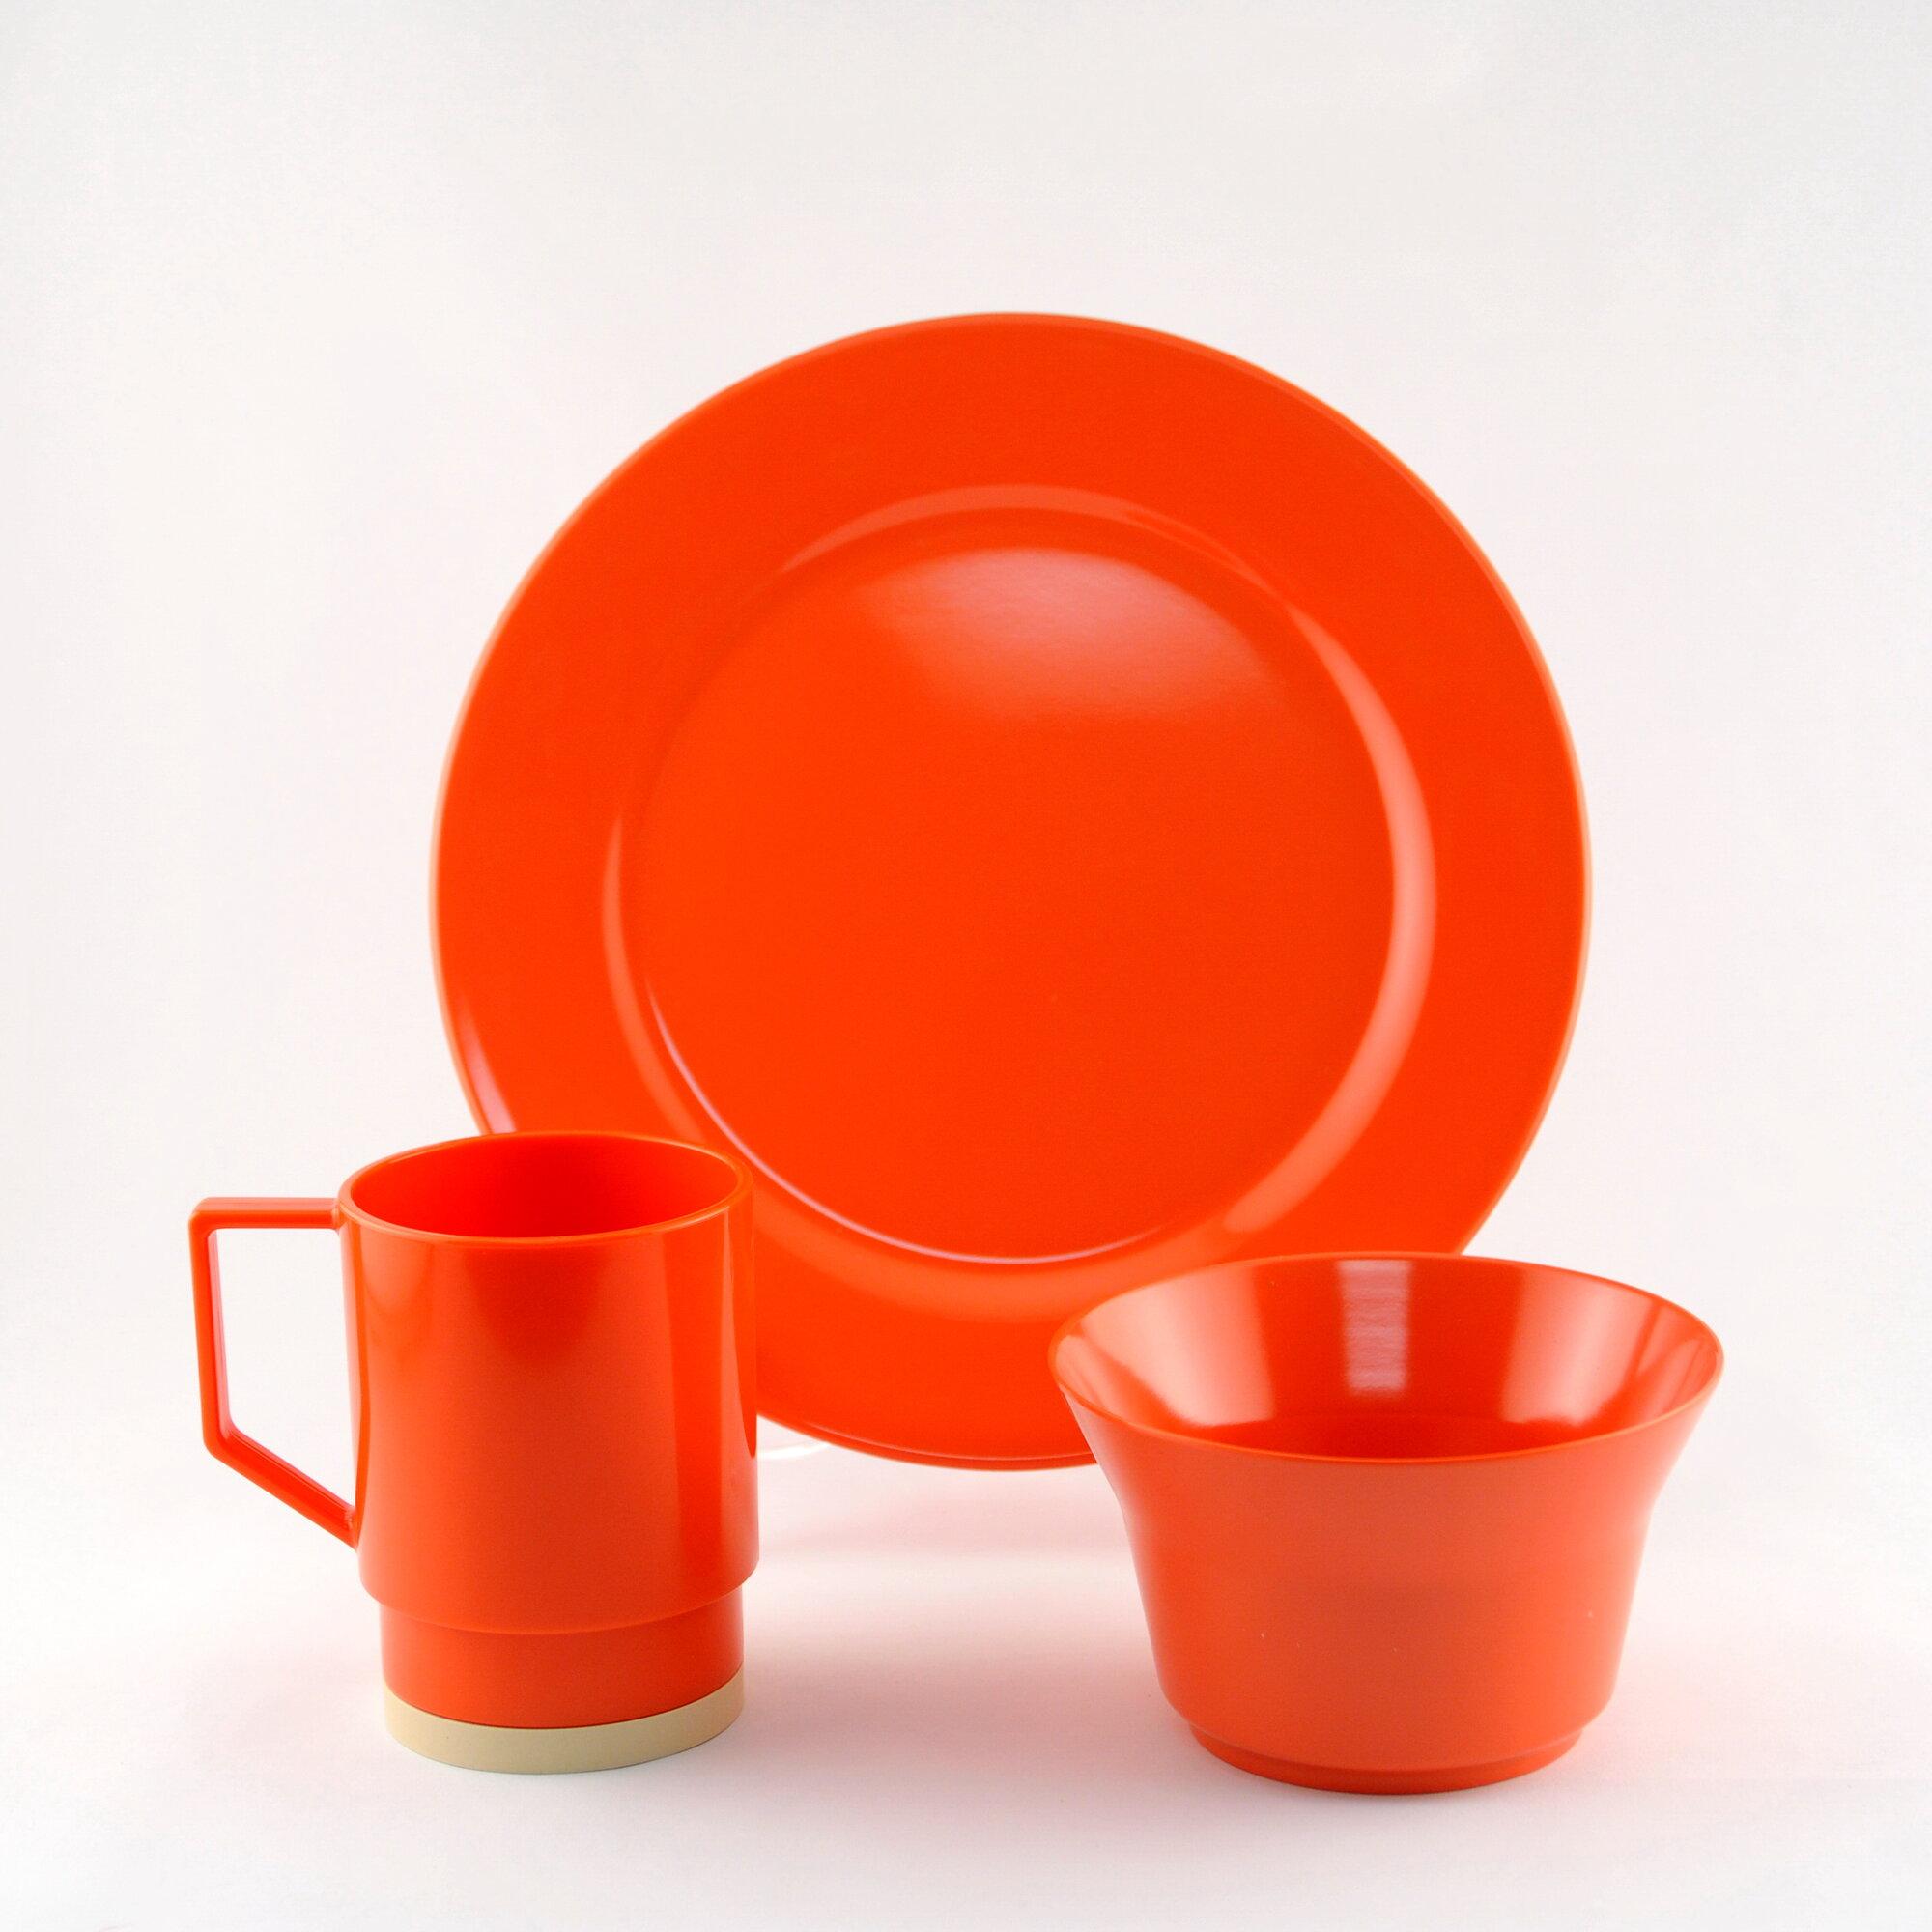 Galleyware Company Melamine 18 Piece Dinnerware Set Salmon | eBay